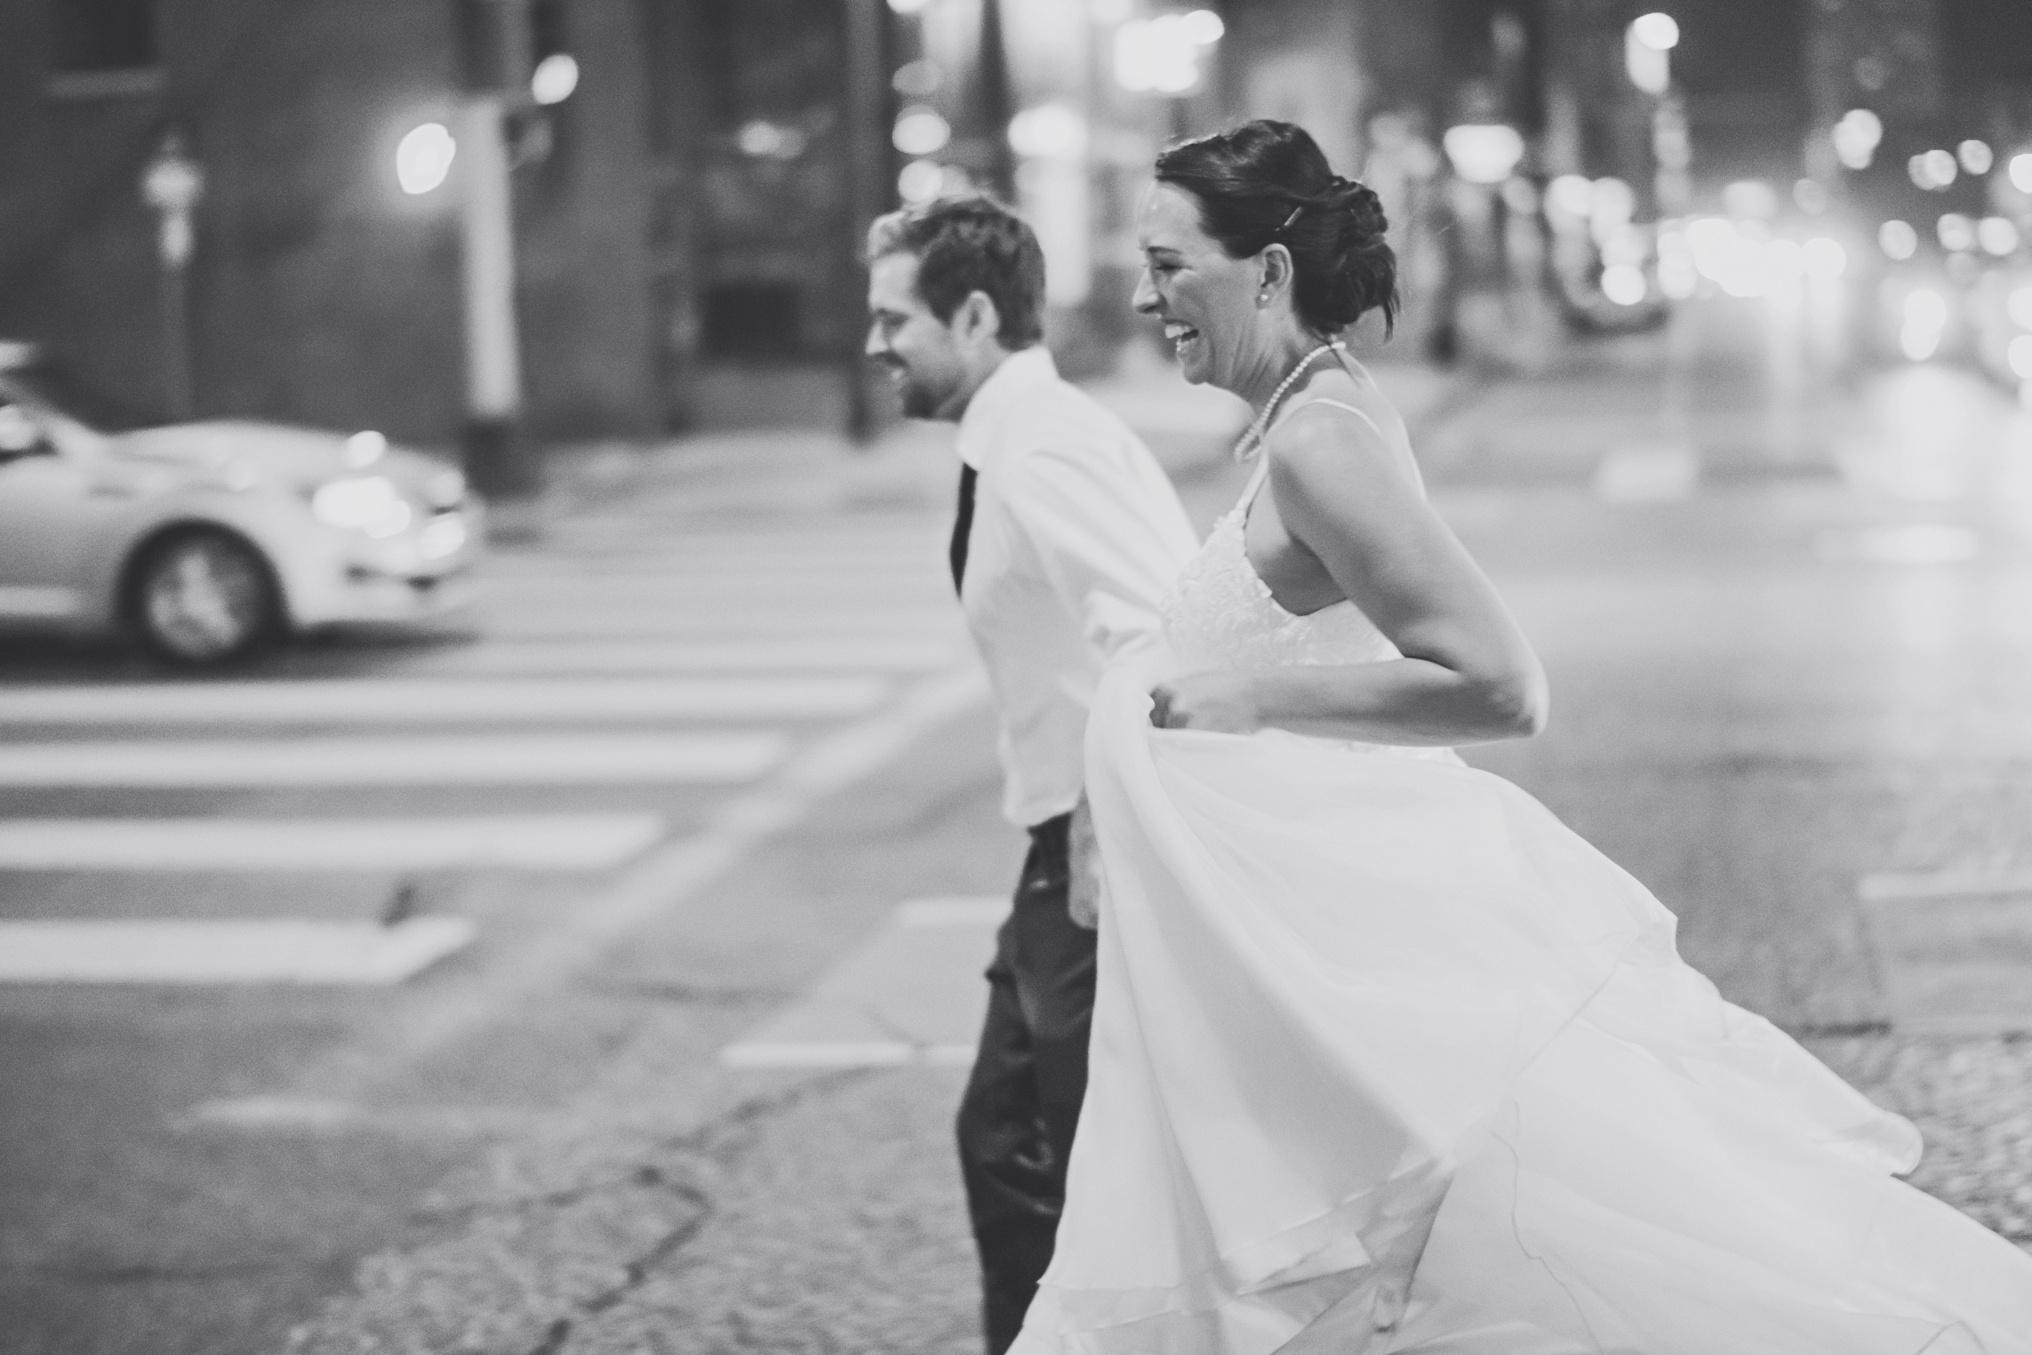 best_wedding_photography_2017_by_lucas_botz_photography_243.jpg